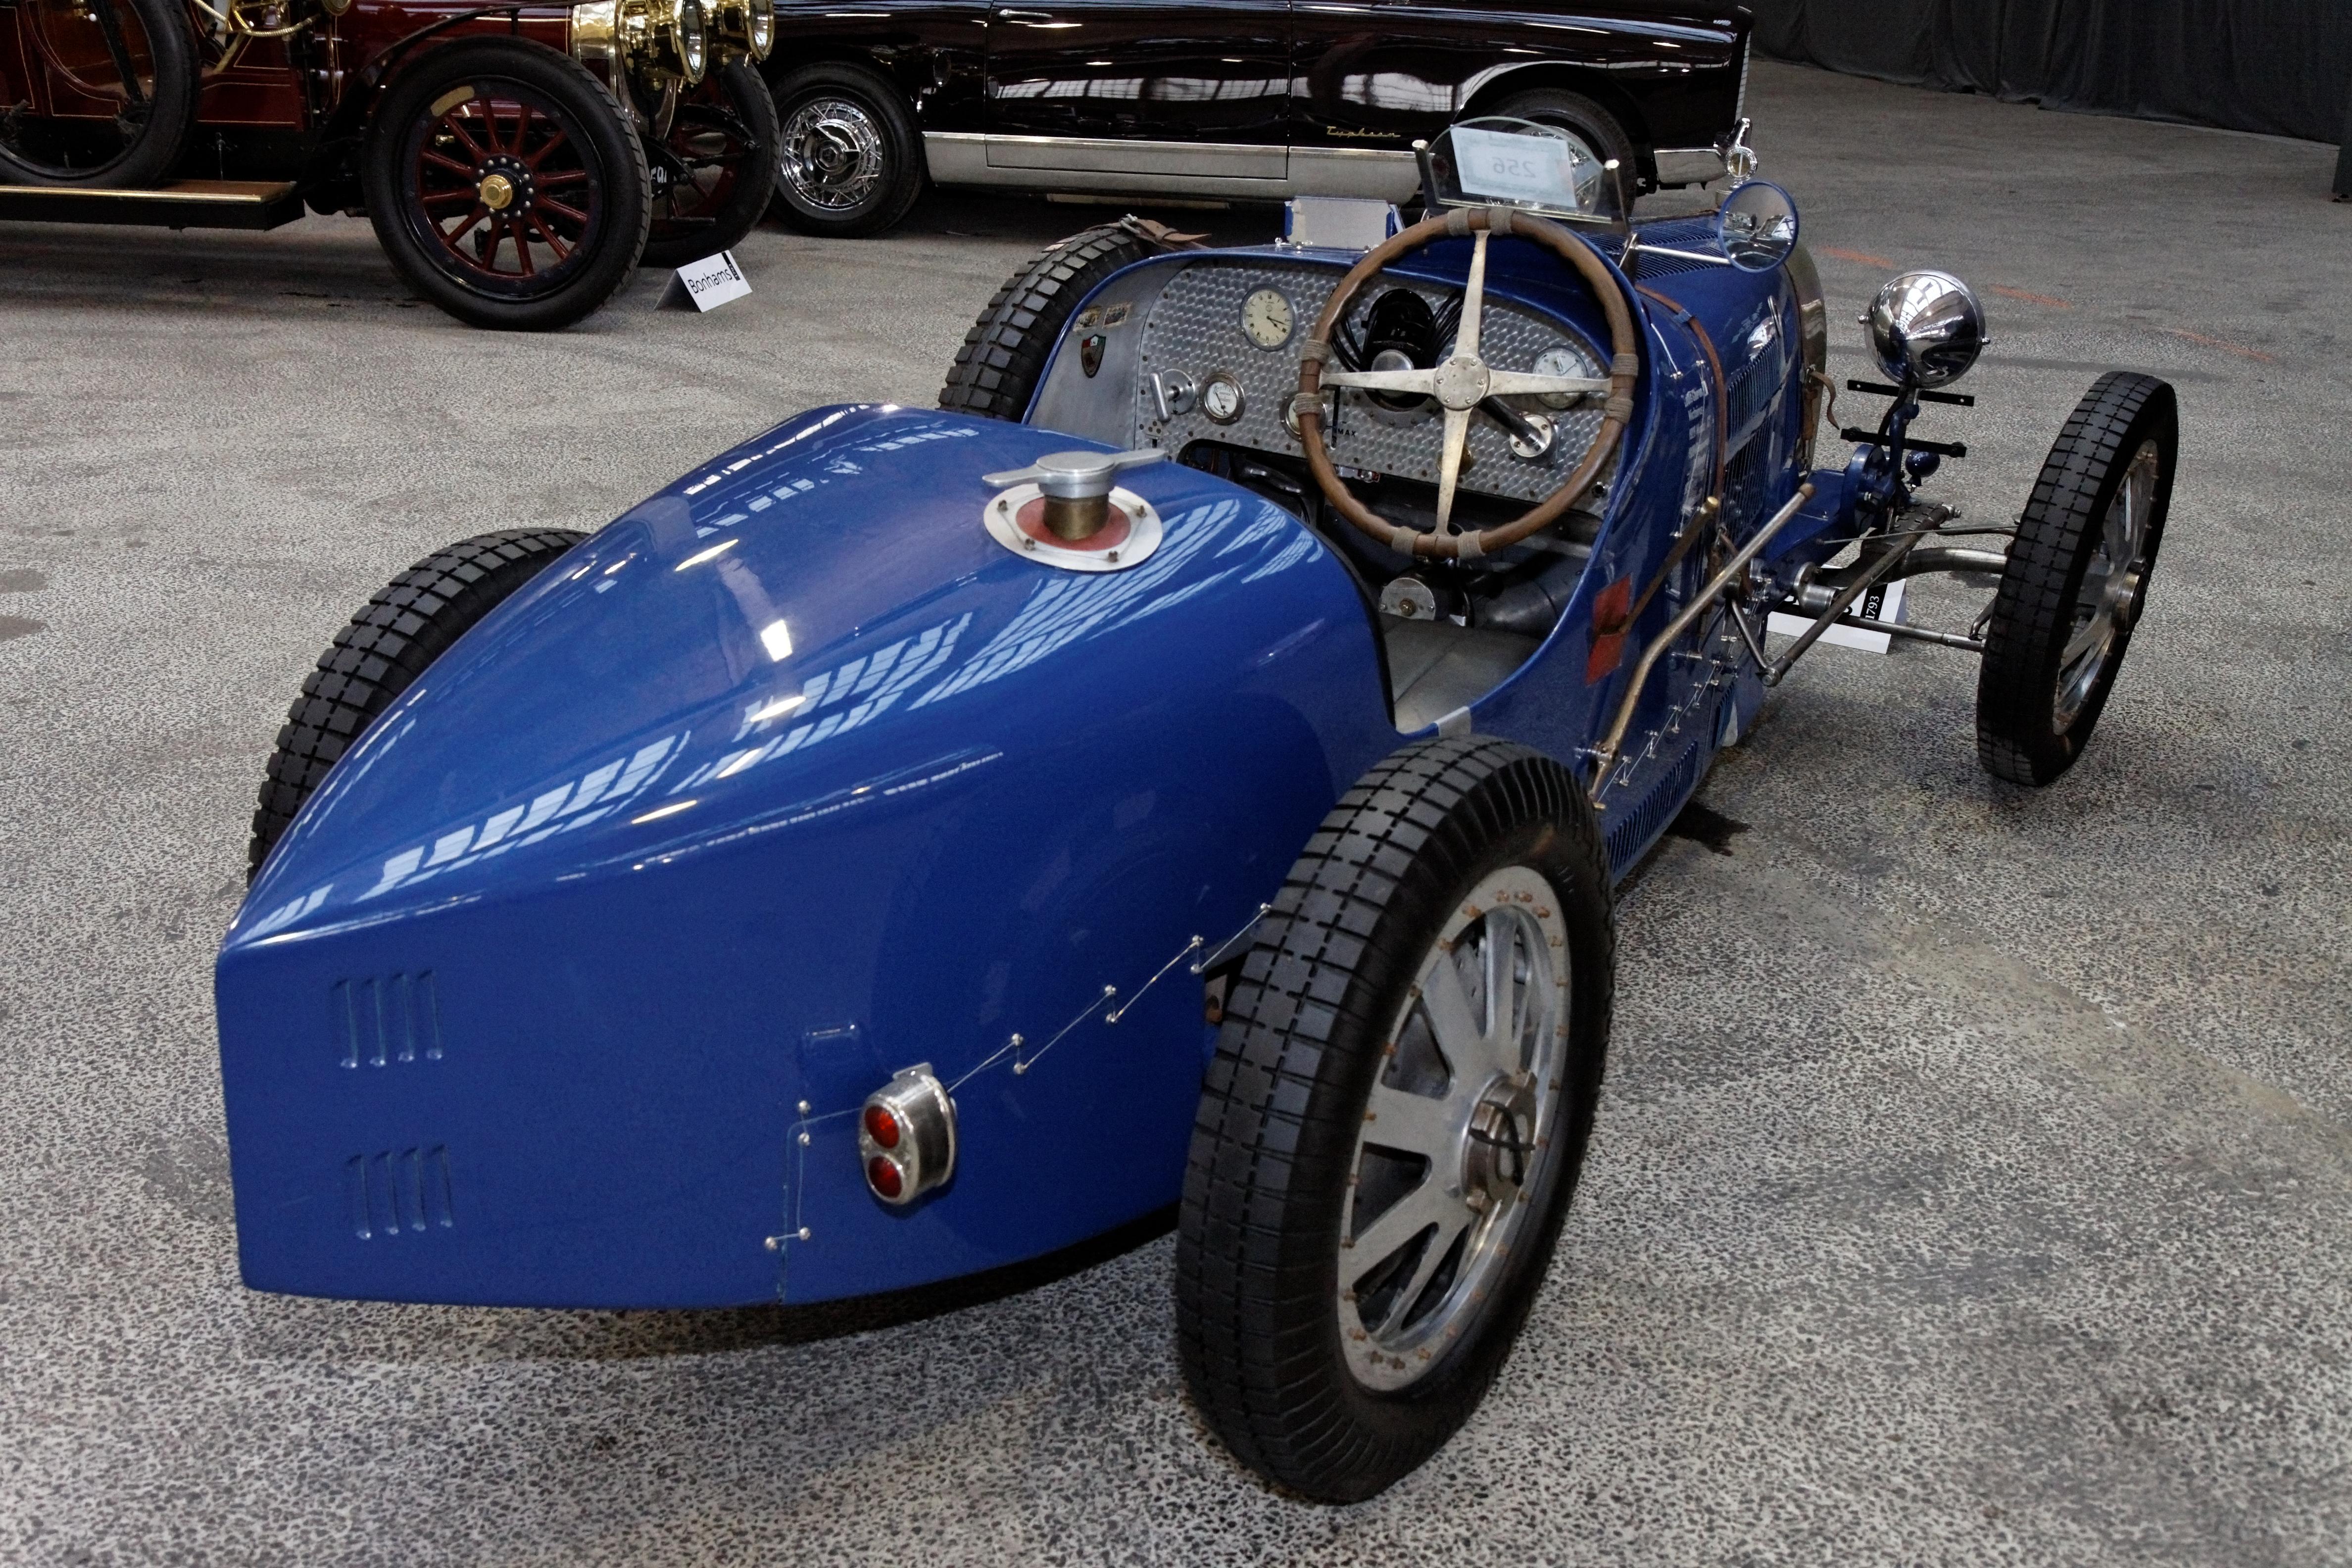 file:bonhams - the paris sale 2012 - bugatti type 35b re-creation